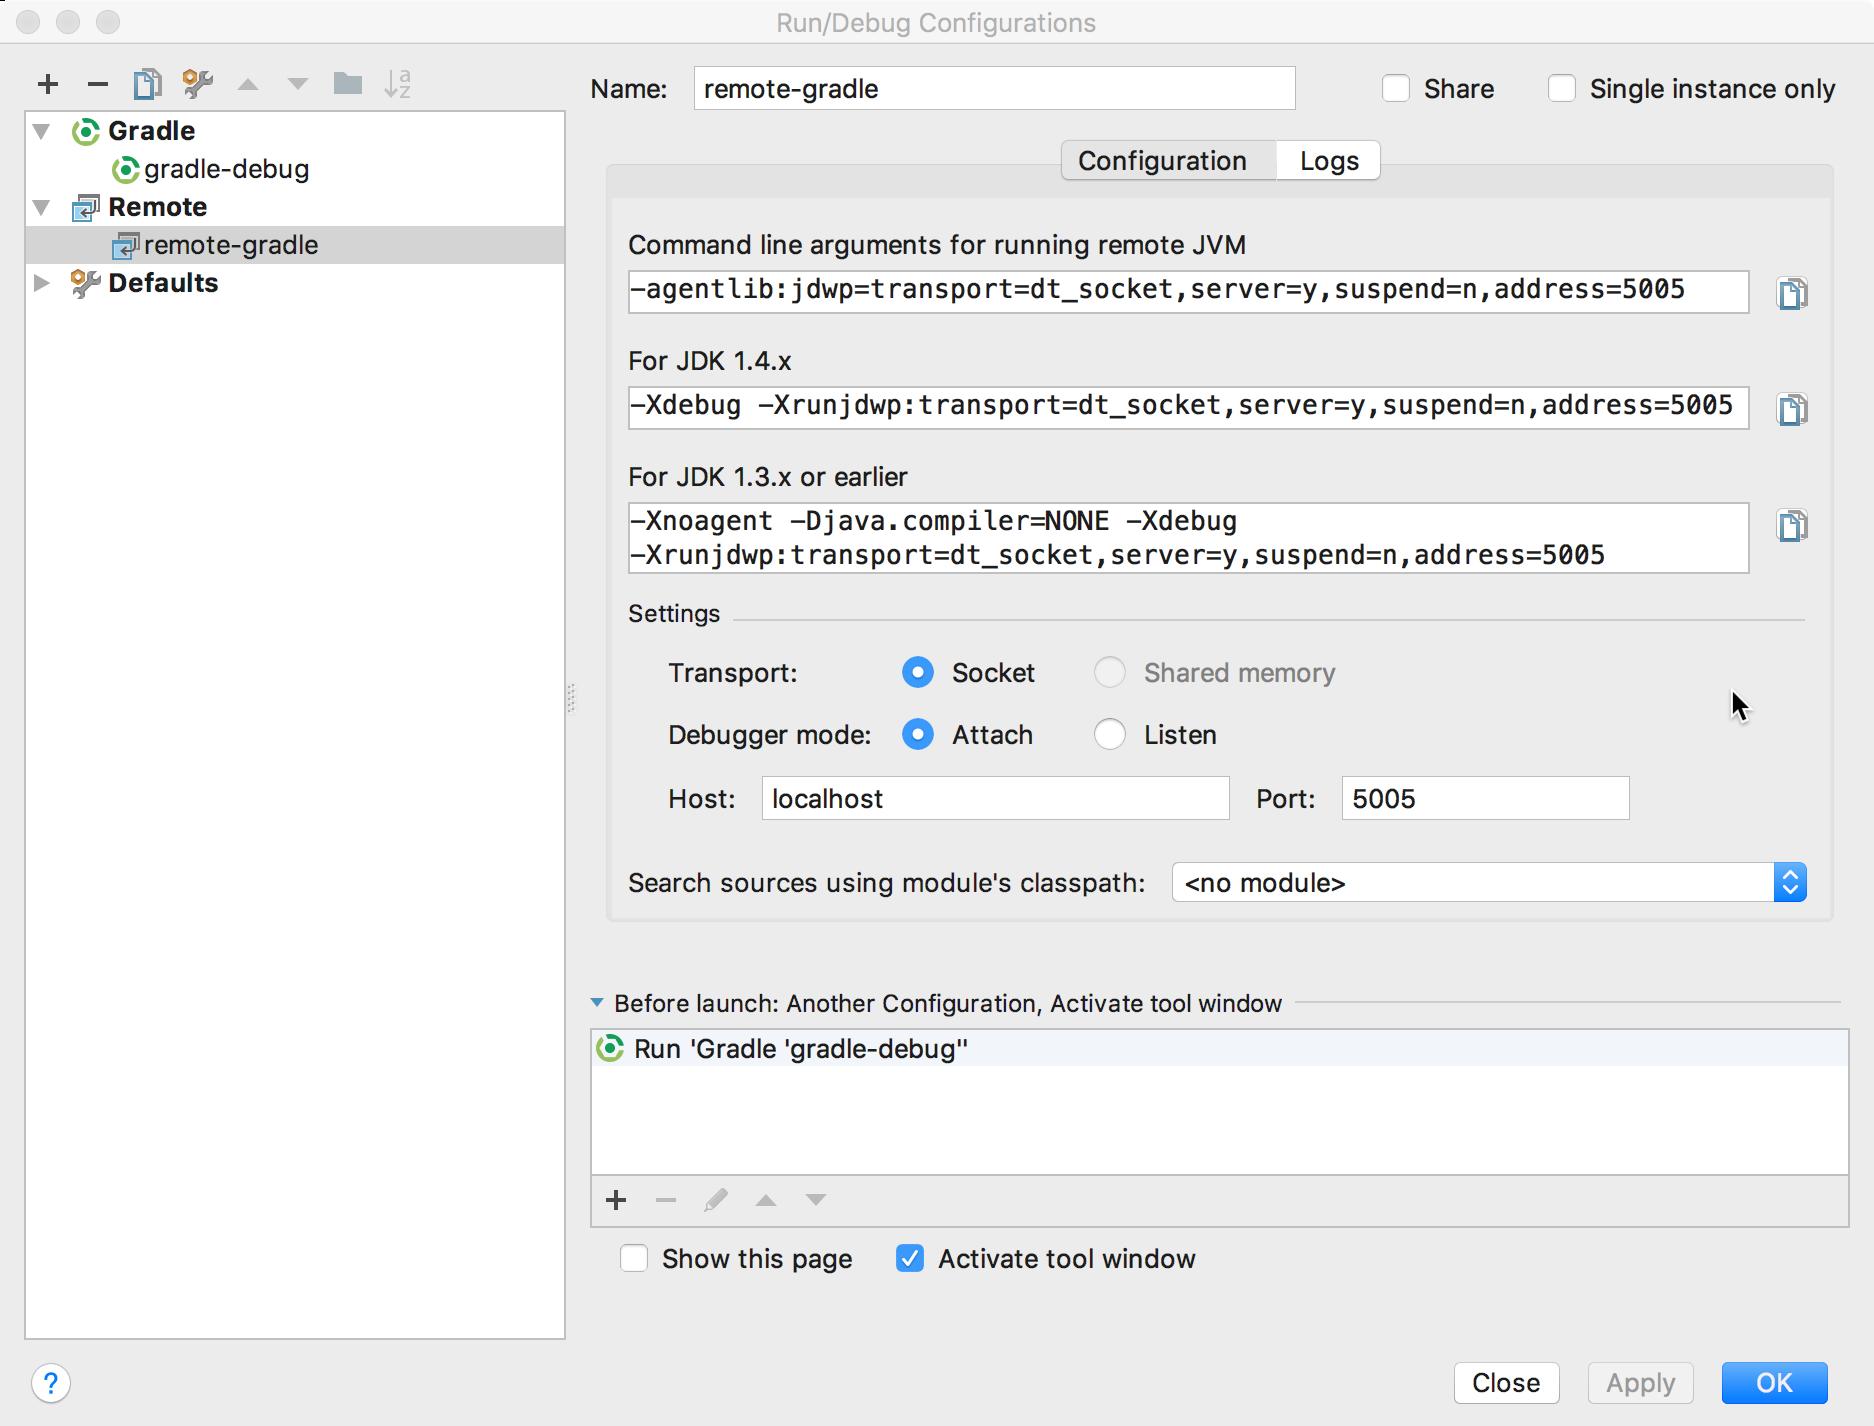 Grafik: Screenshot mit dem Dialogfeld